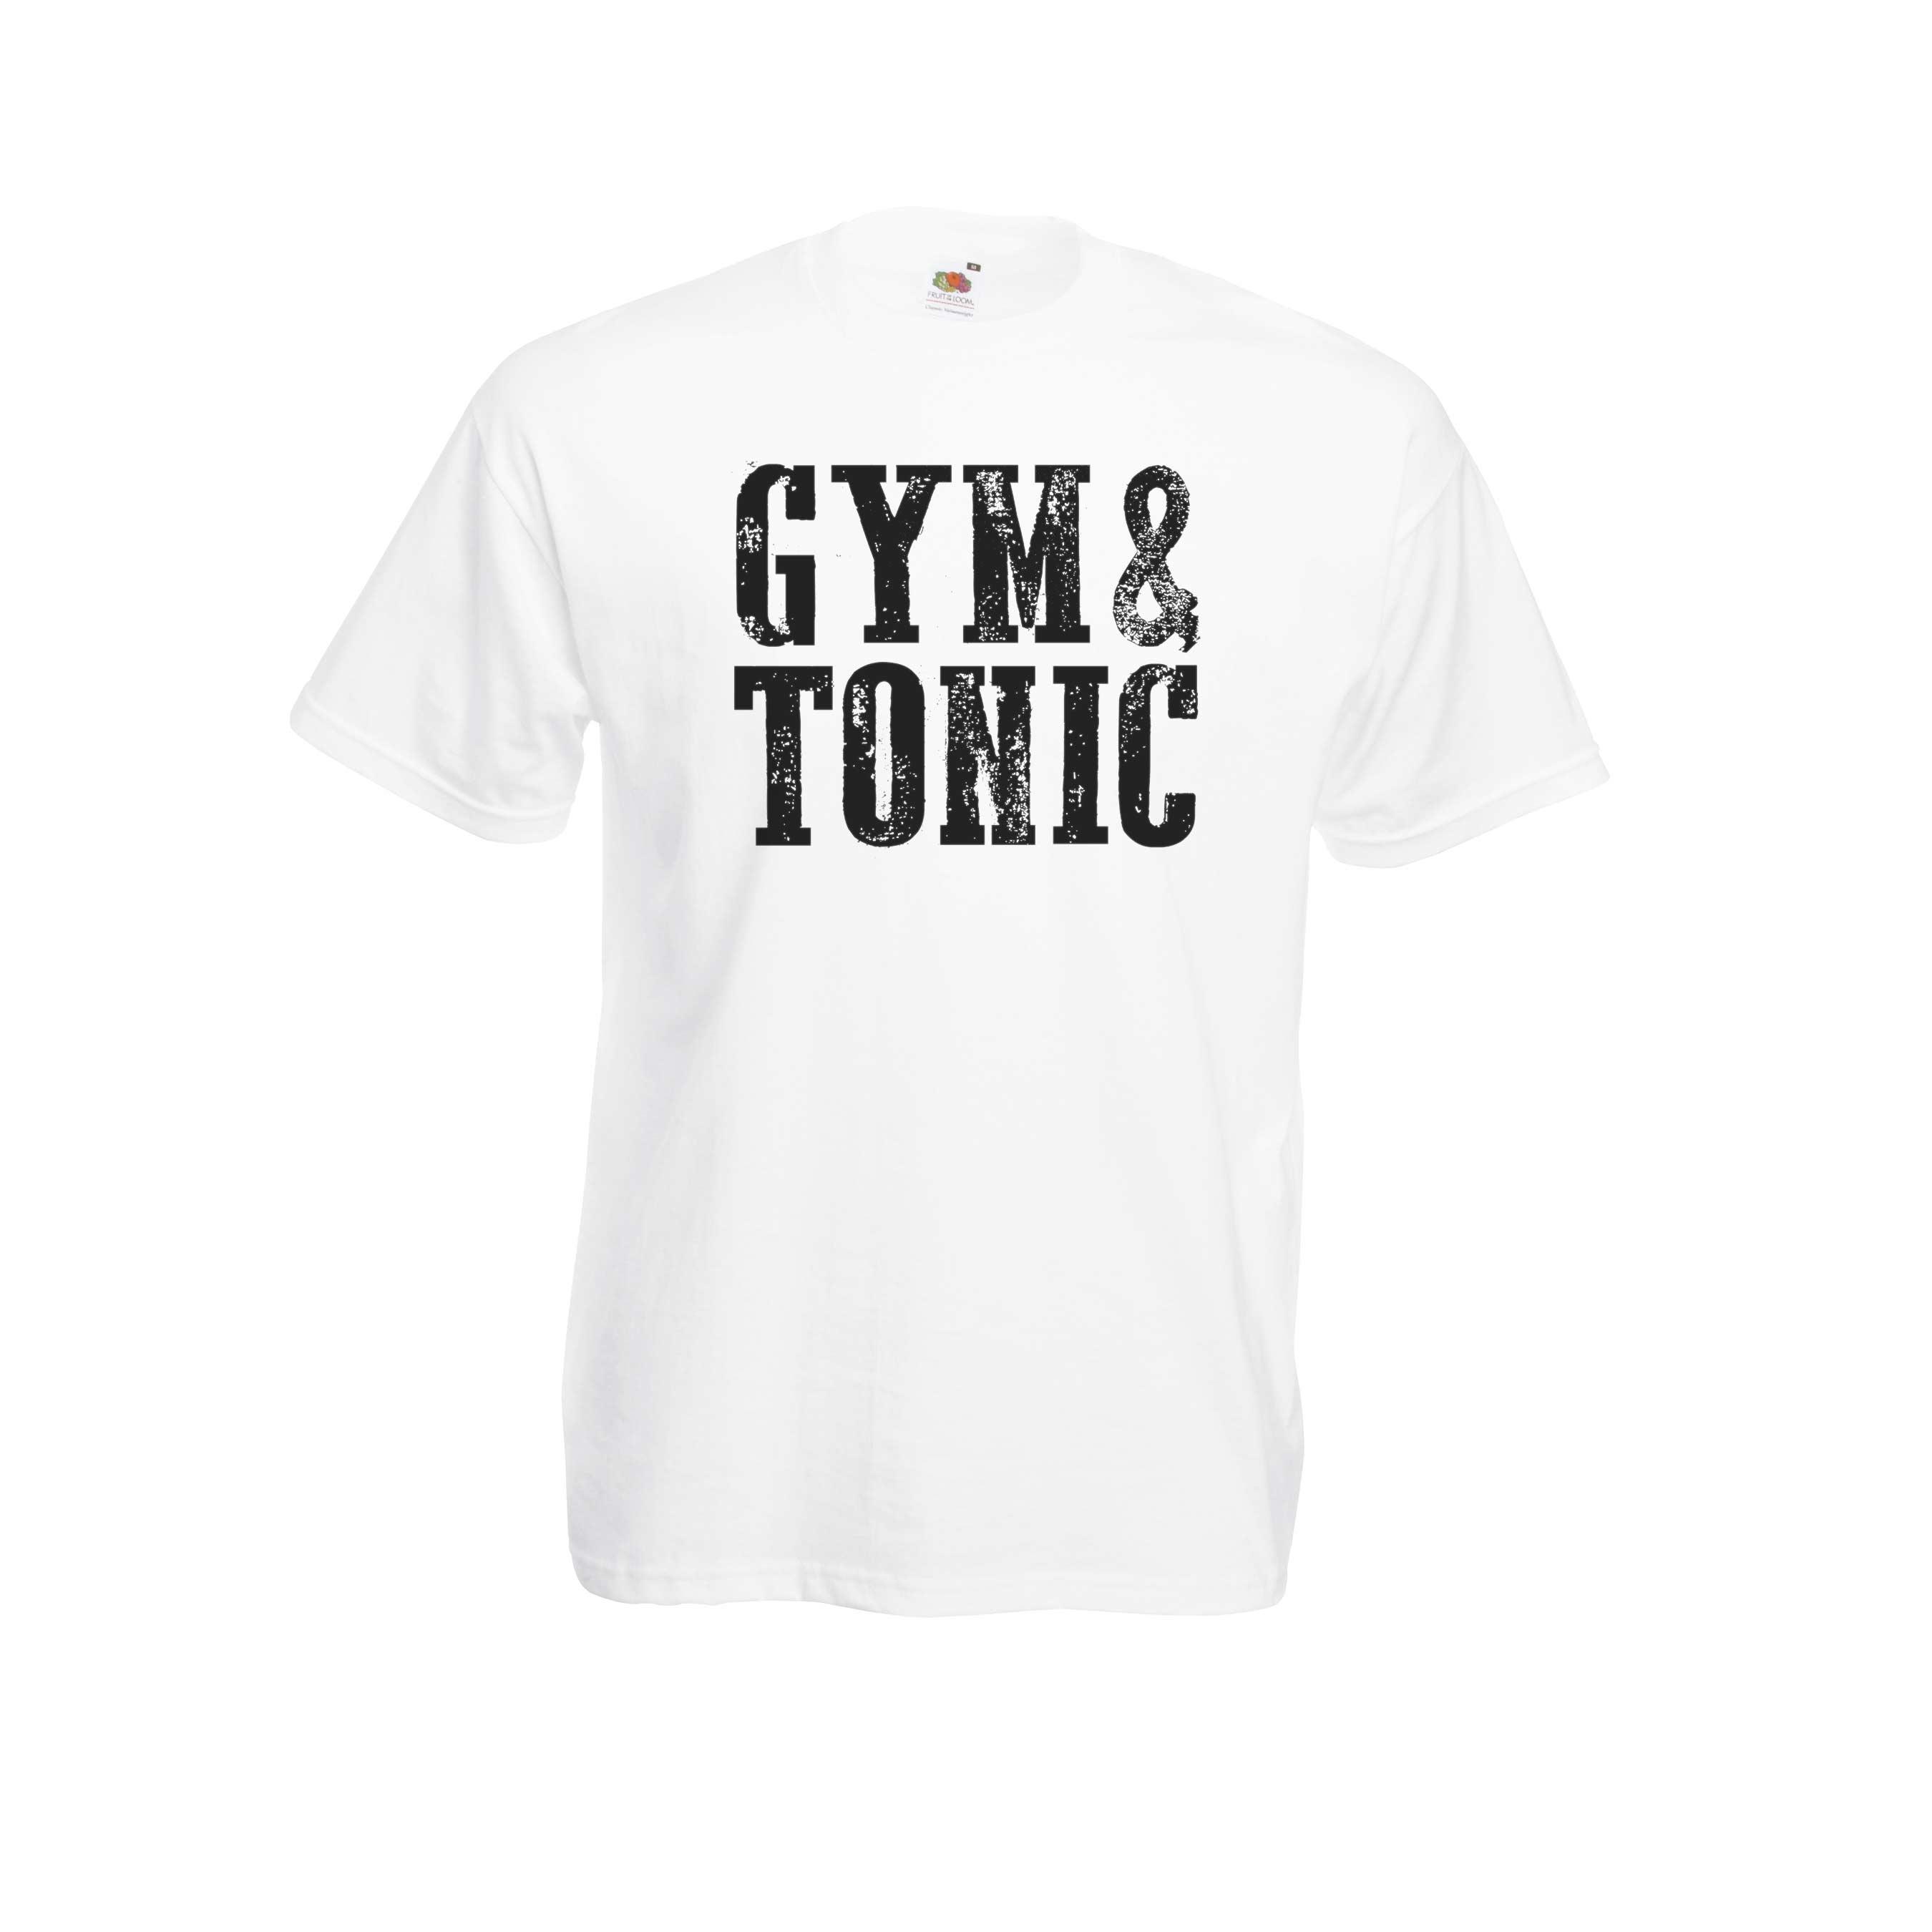 Gym & Tonic design for t-shirt, hoodie & sweatshirt